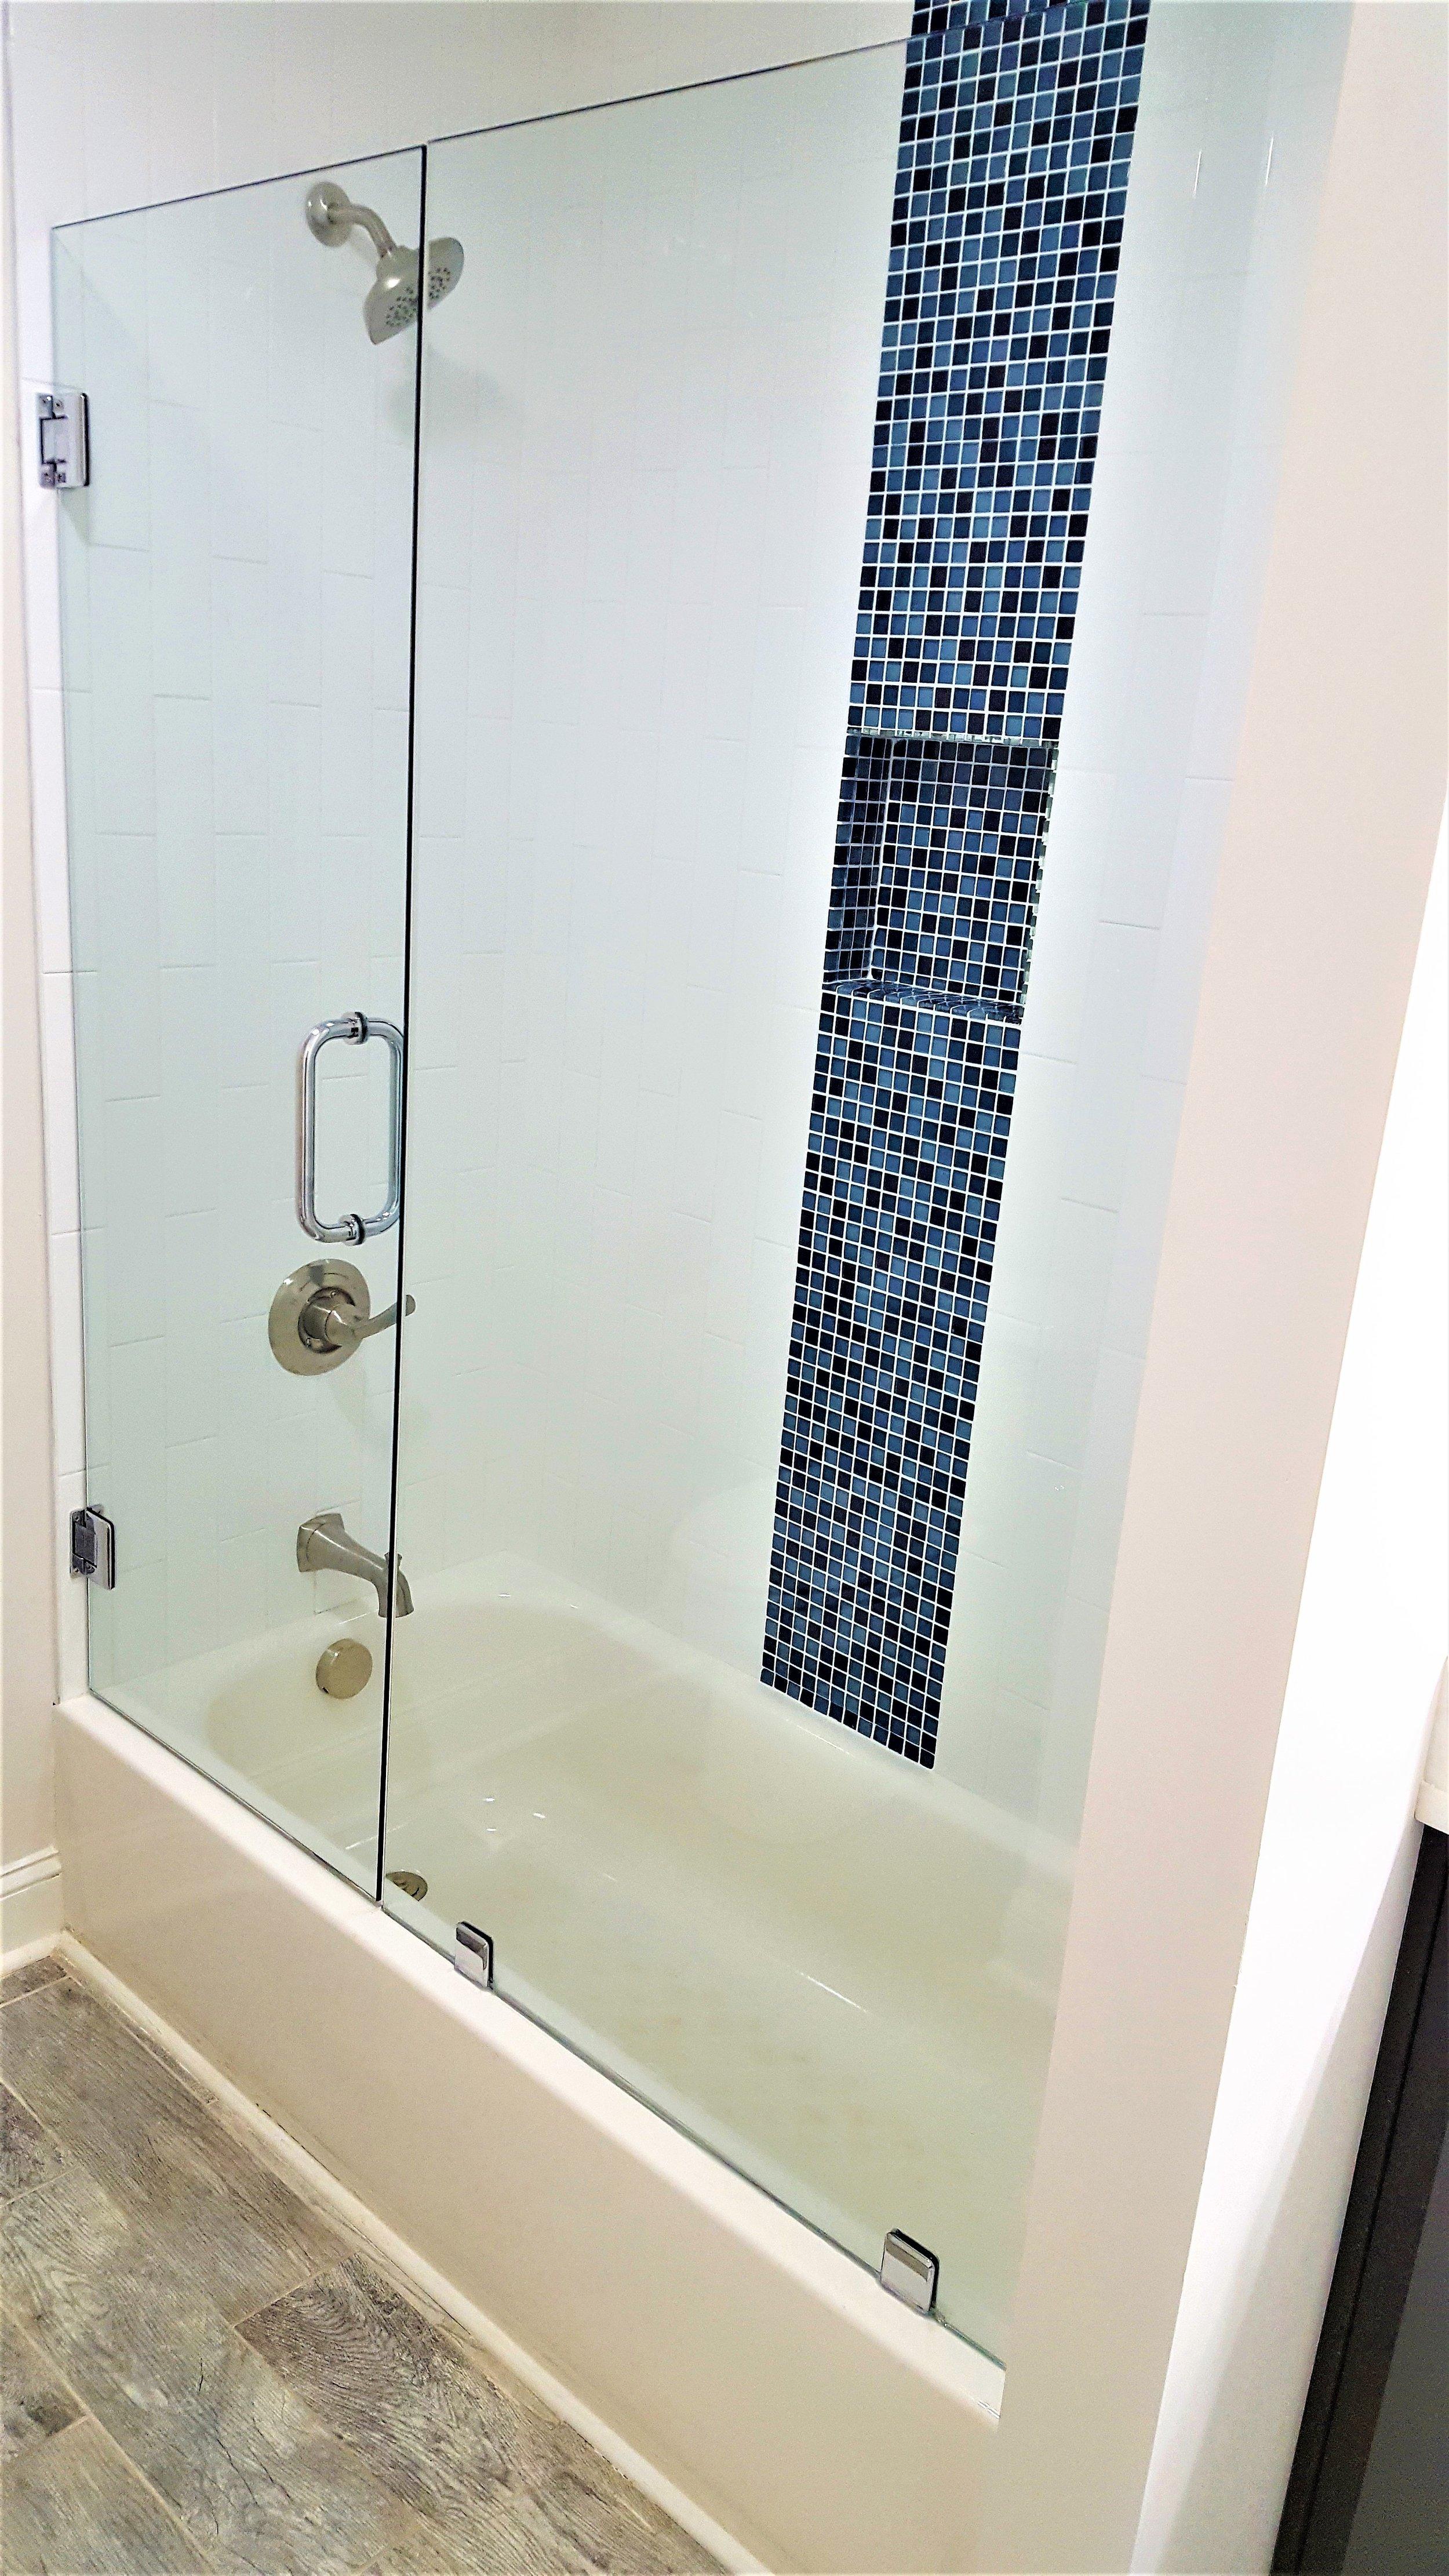 Frameless Shower Doors Clarksville 931 645 2464